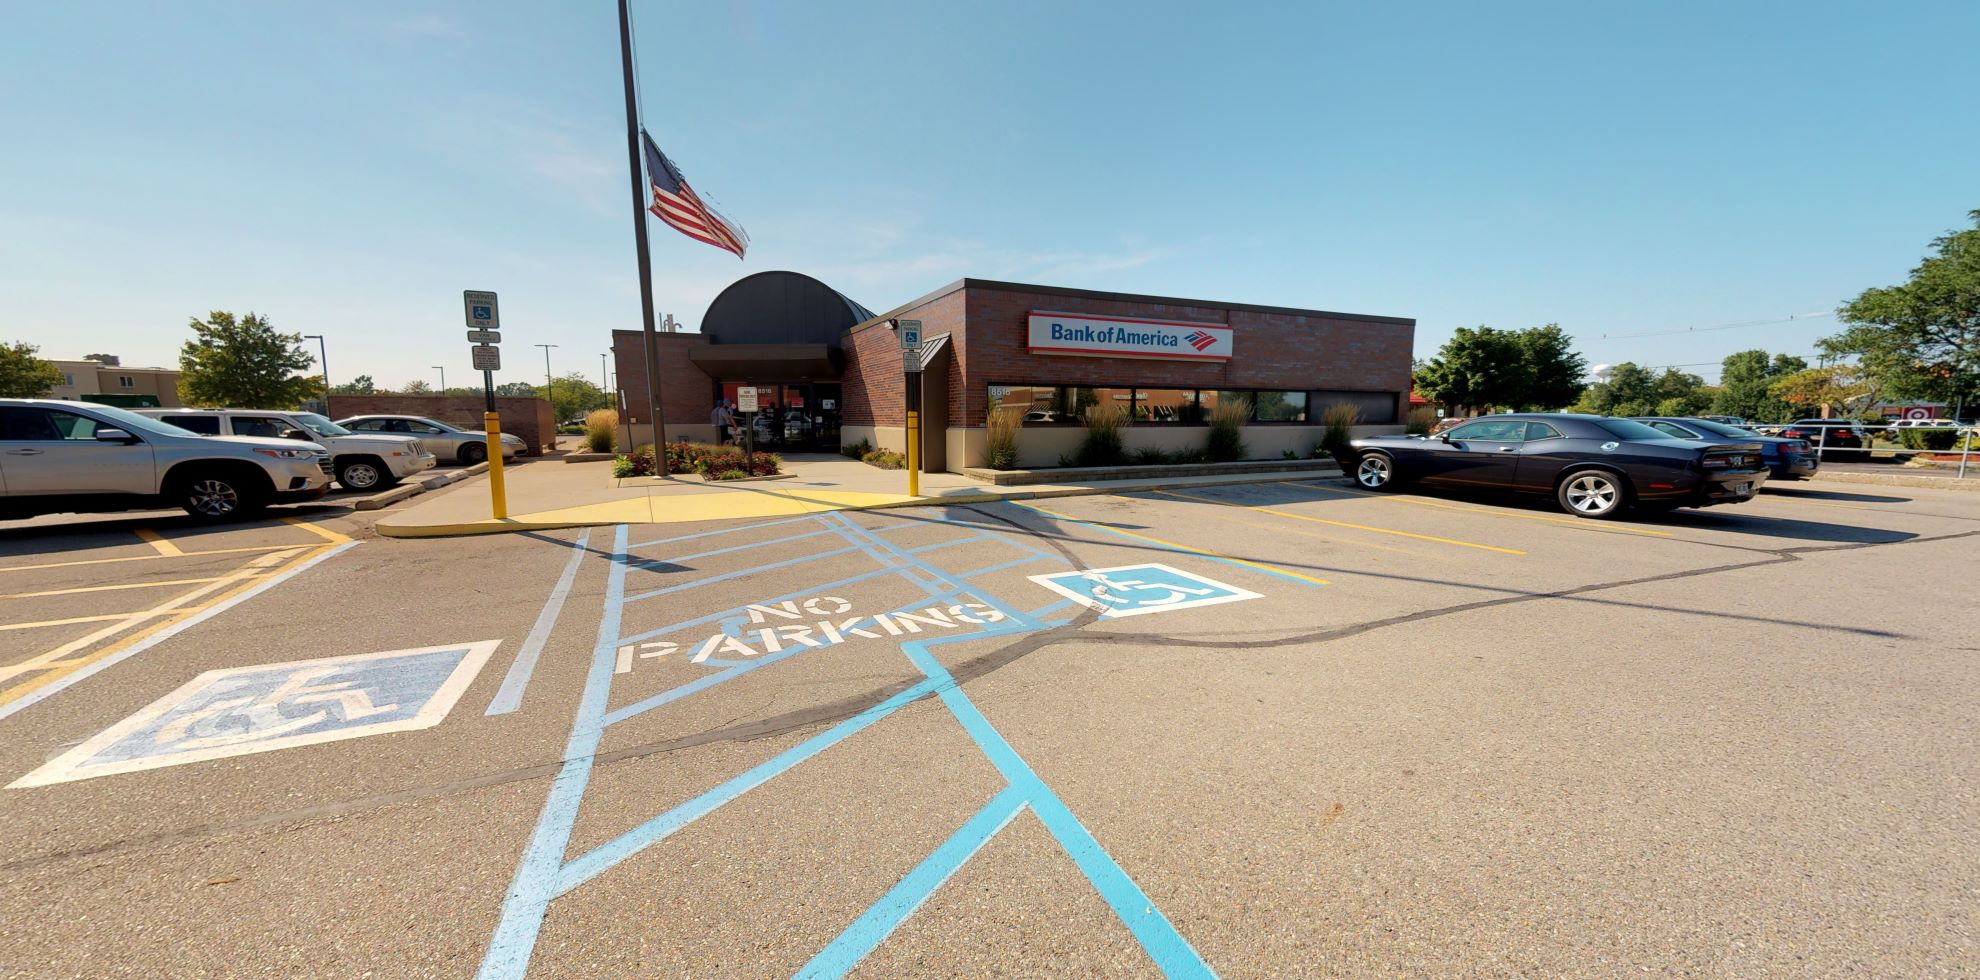 Bank of America financial center with drive-thru ATM   8516 W Grand River Ave, Brighton, MI 48116